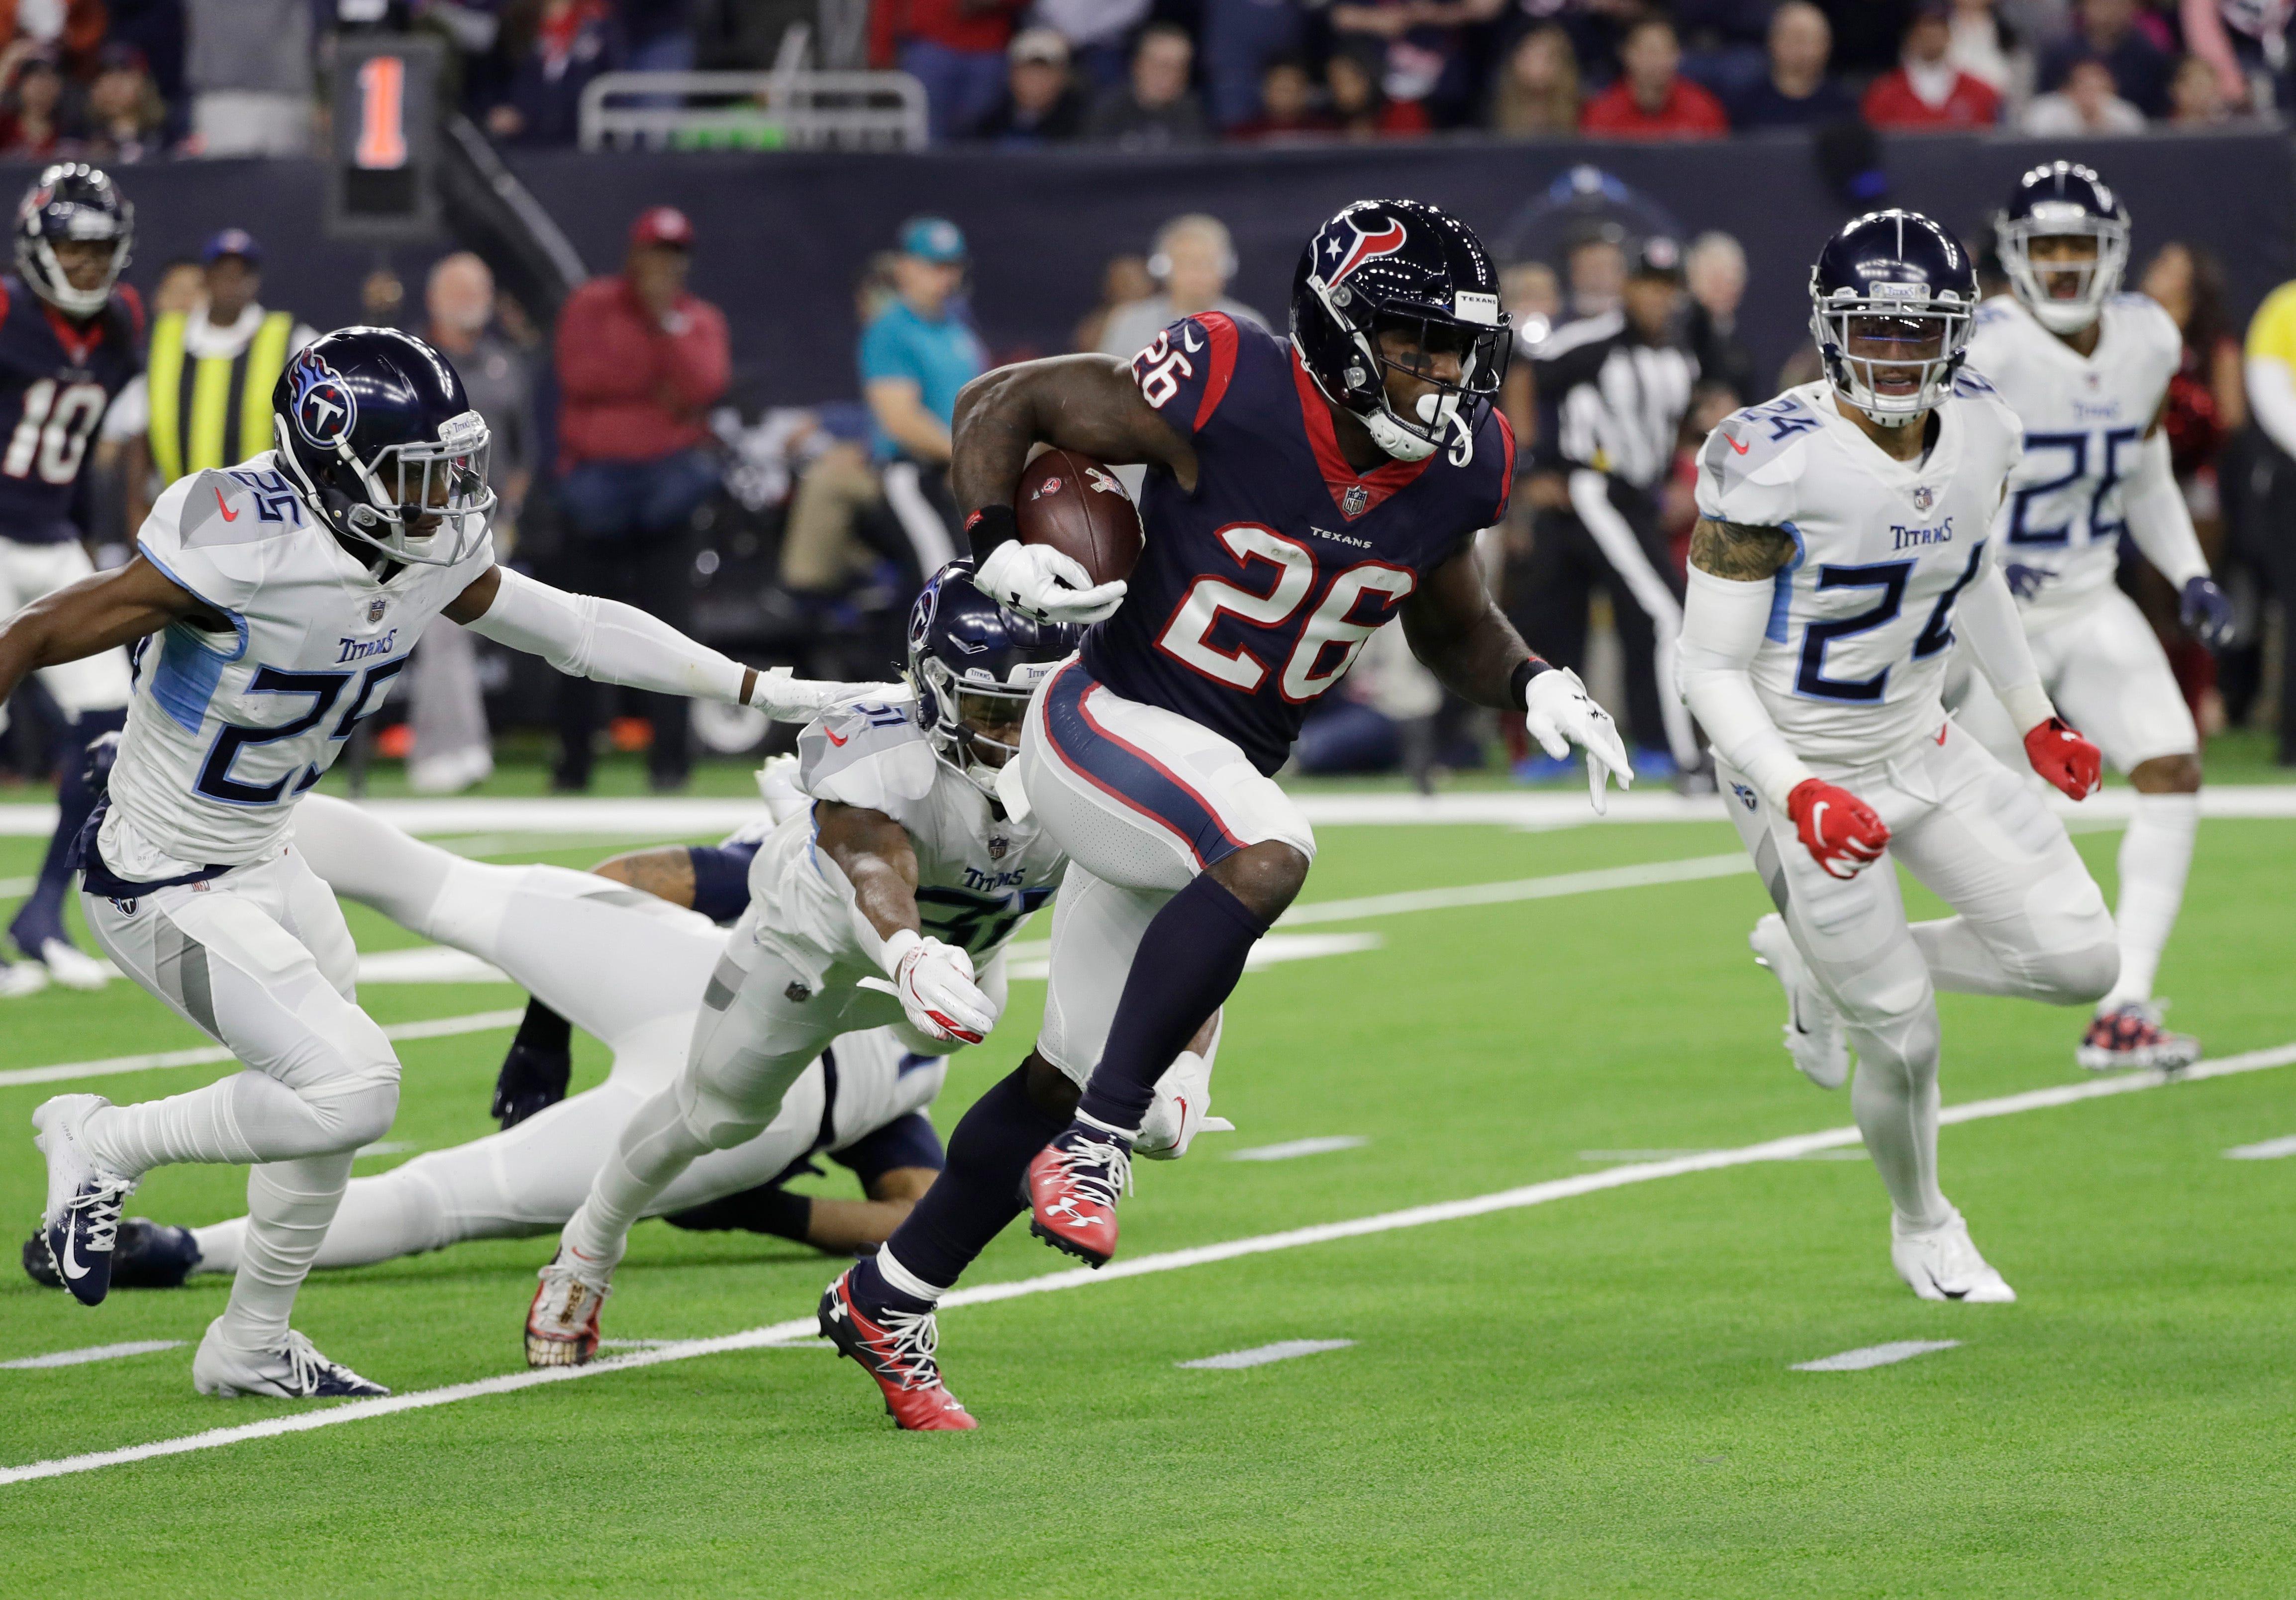 Lamar Miller makes NFL history with 97-yard touchdown run vs. Titans